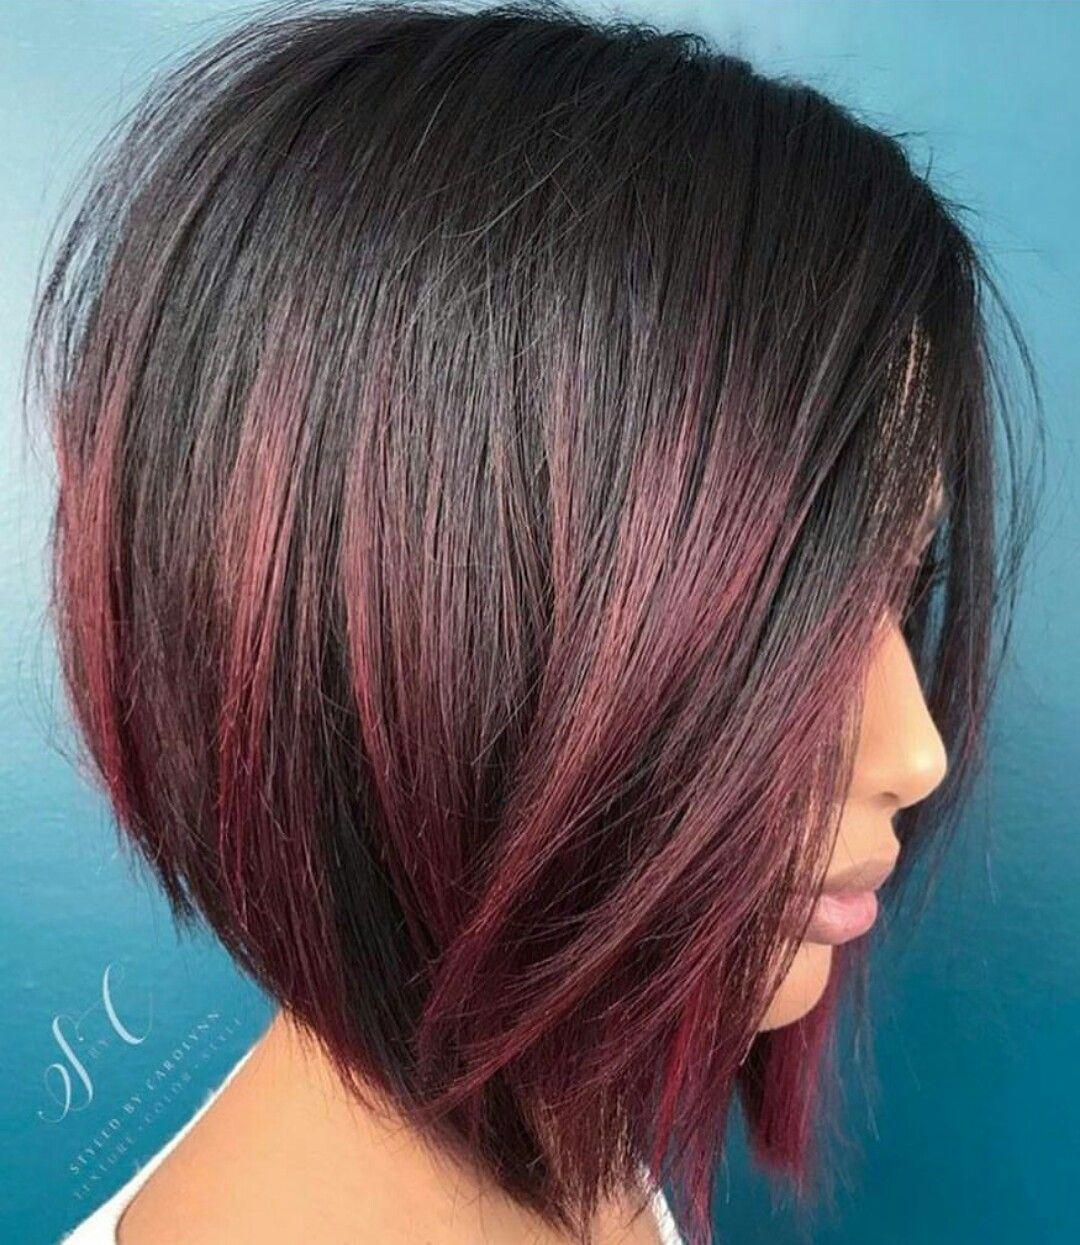 Pin by kenzie de rademaeker on haar pinterest haircuts hair